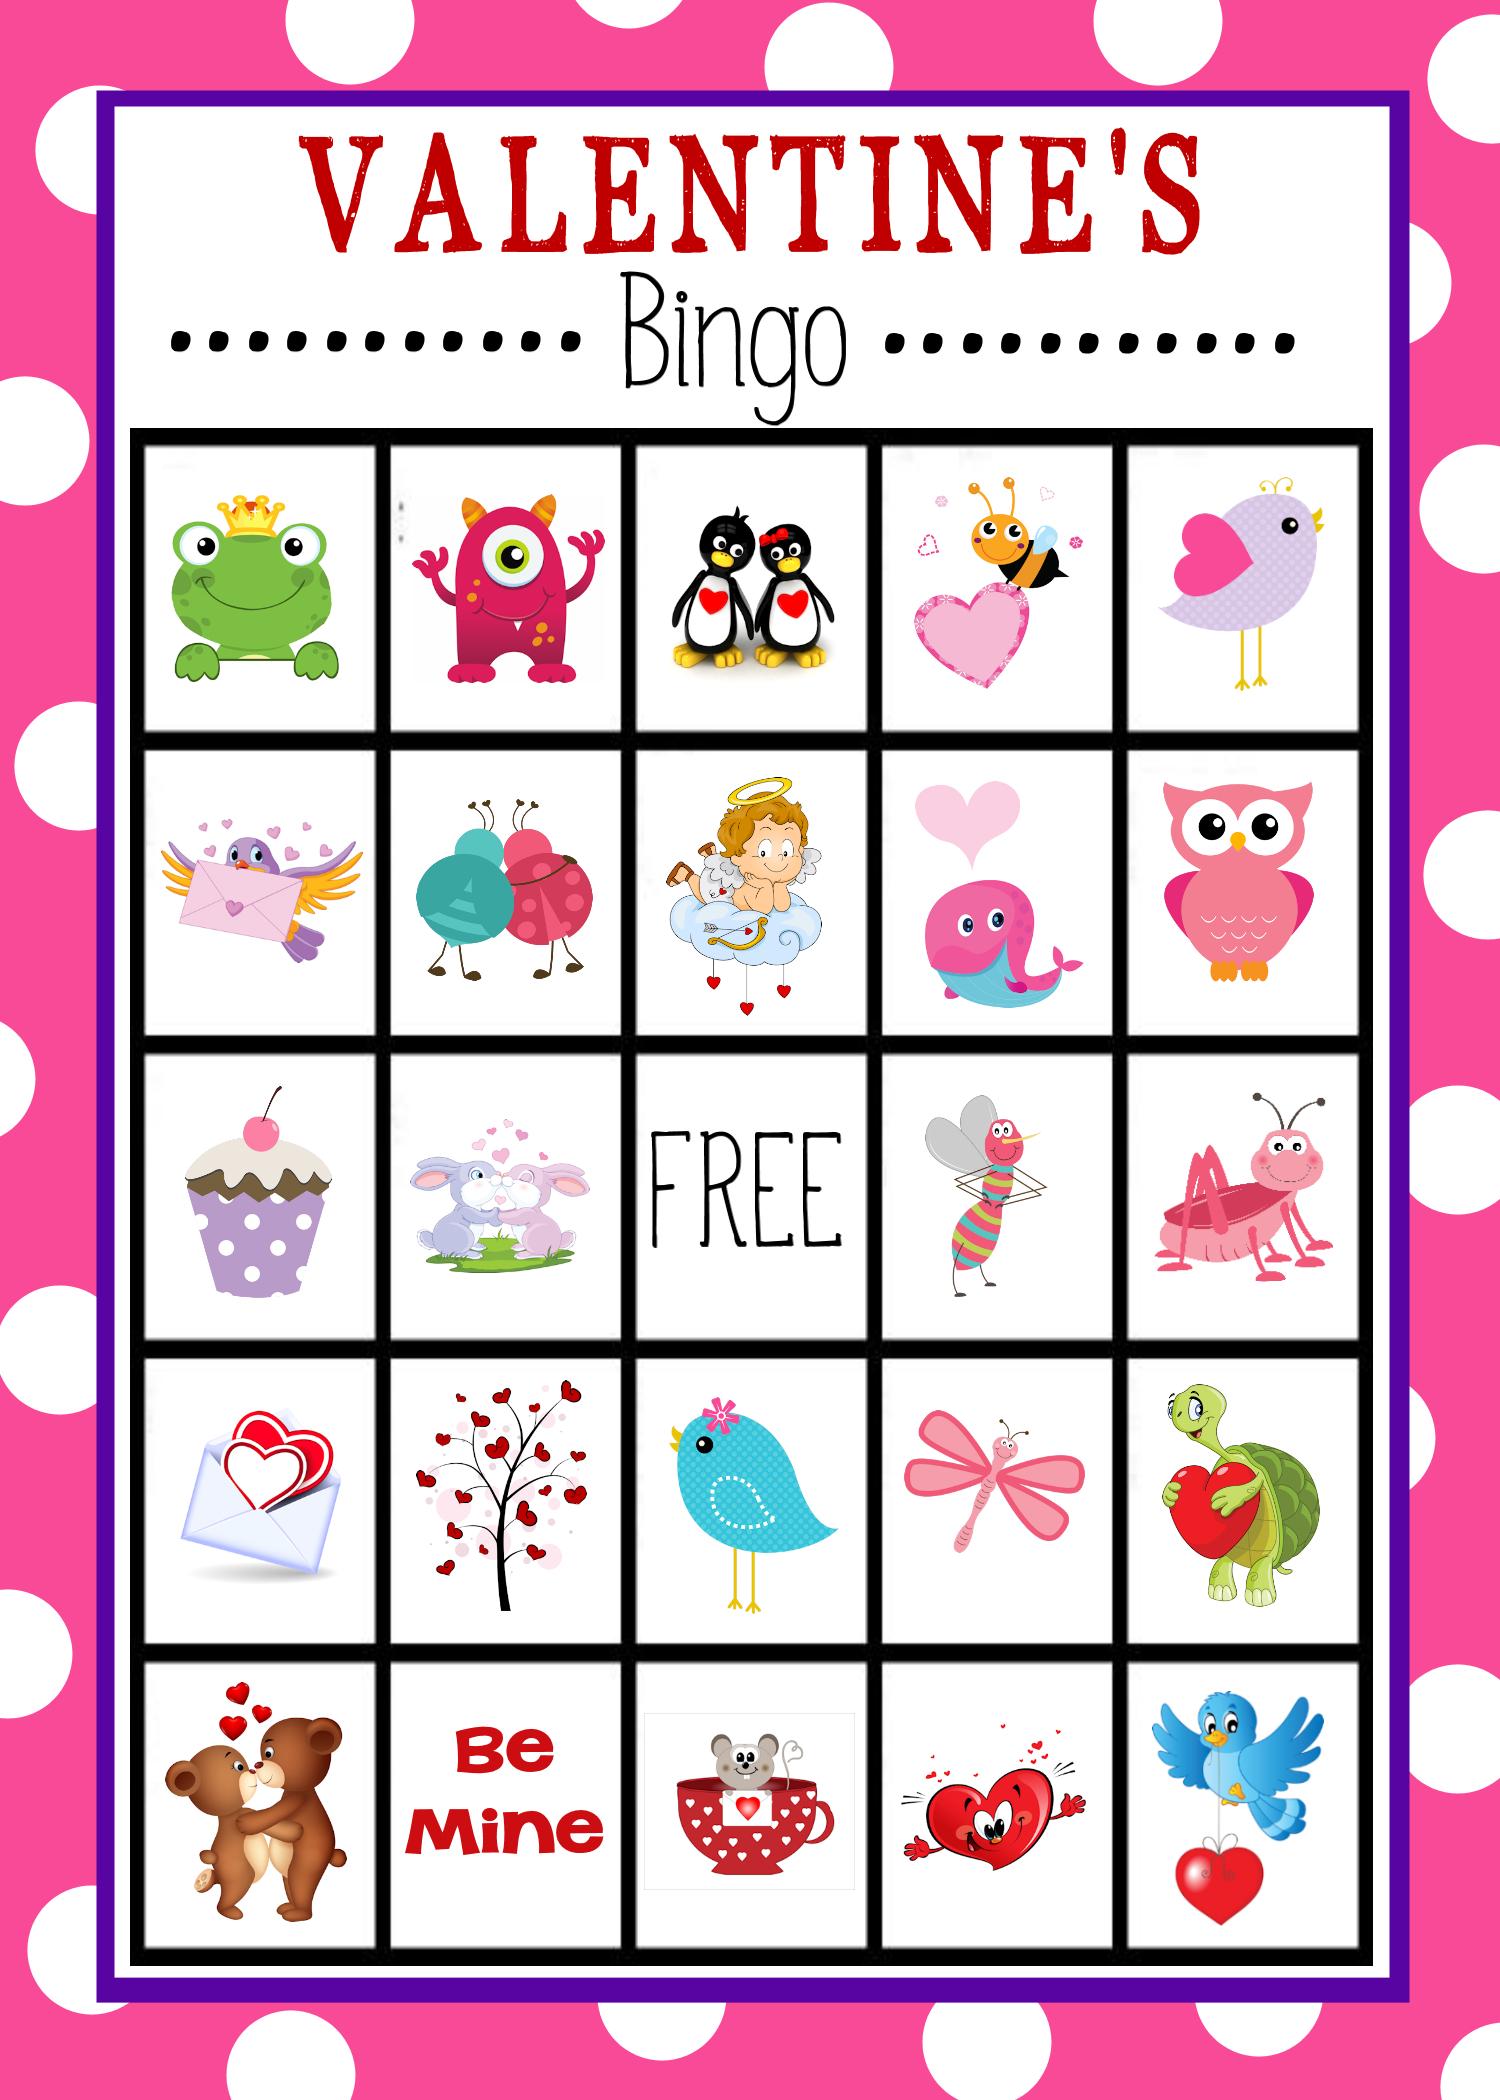 Valentine's Bingo Game To Print & Play | Valentine's Day Activities - Valentines Bingo Cards Free Printable